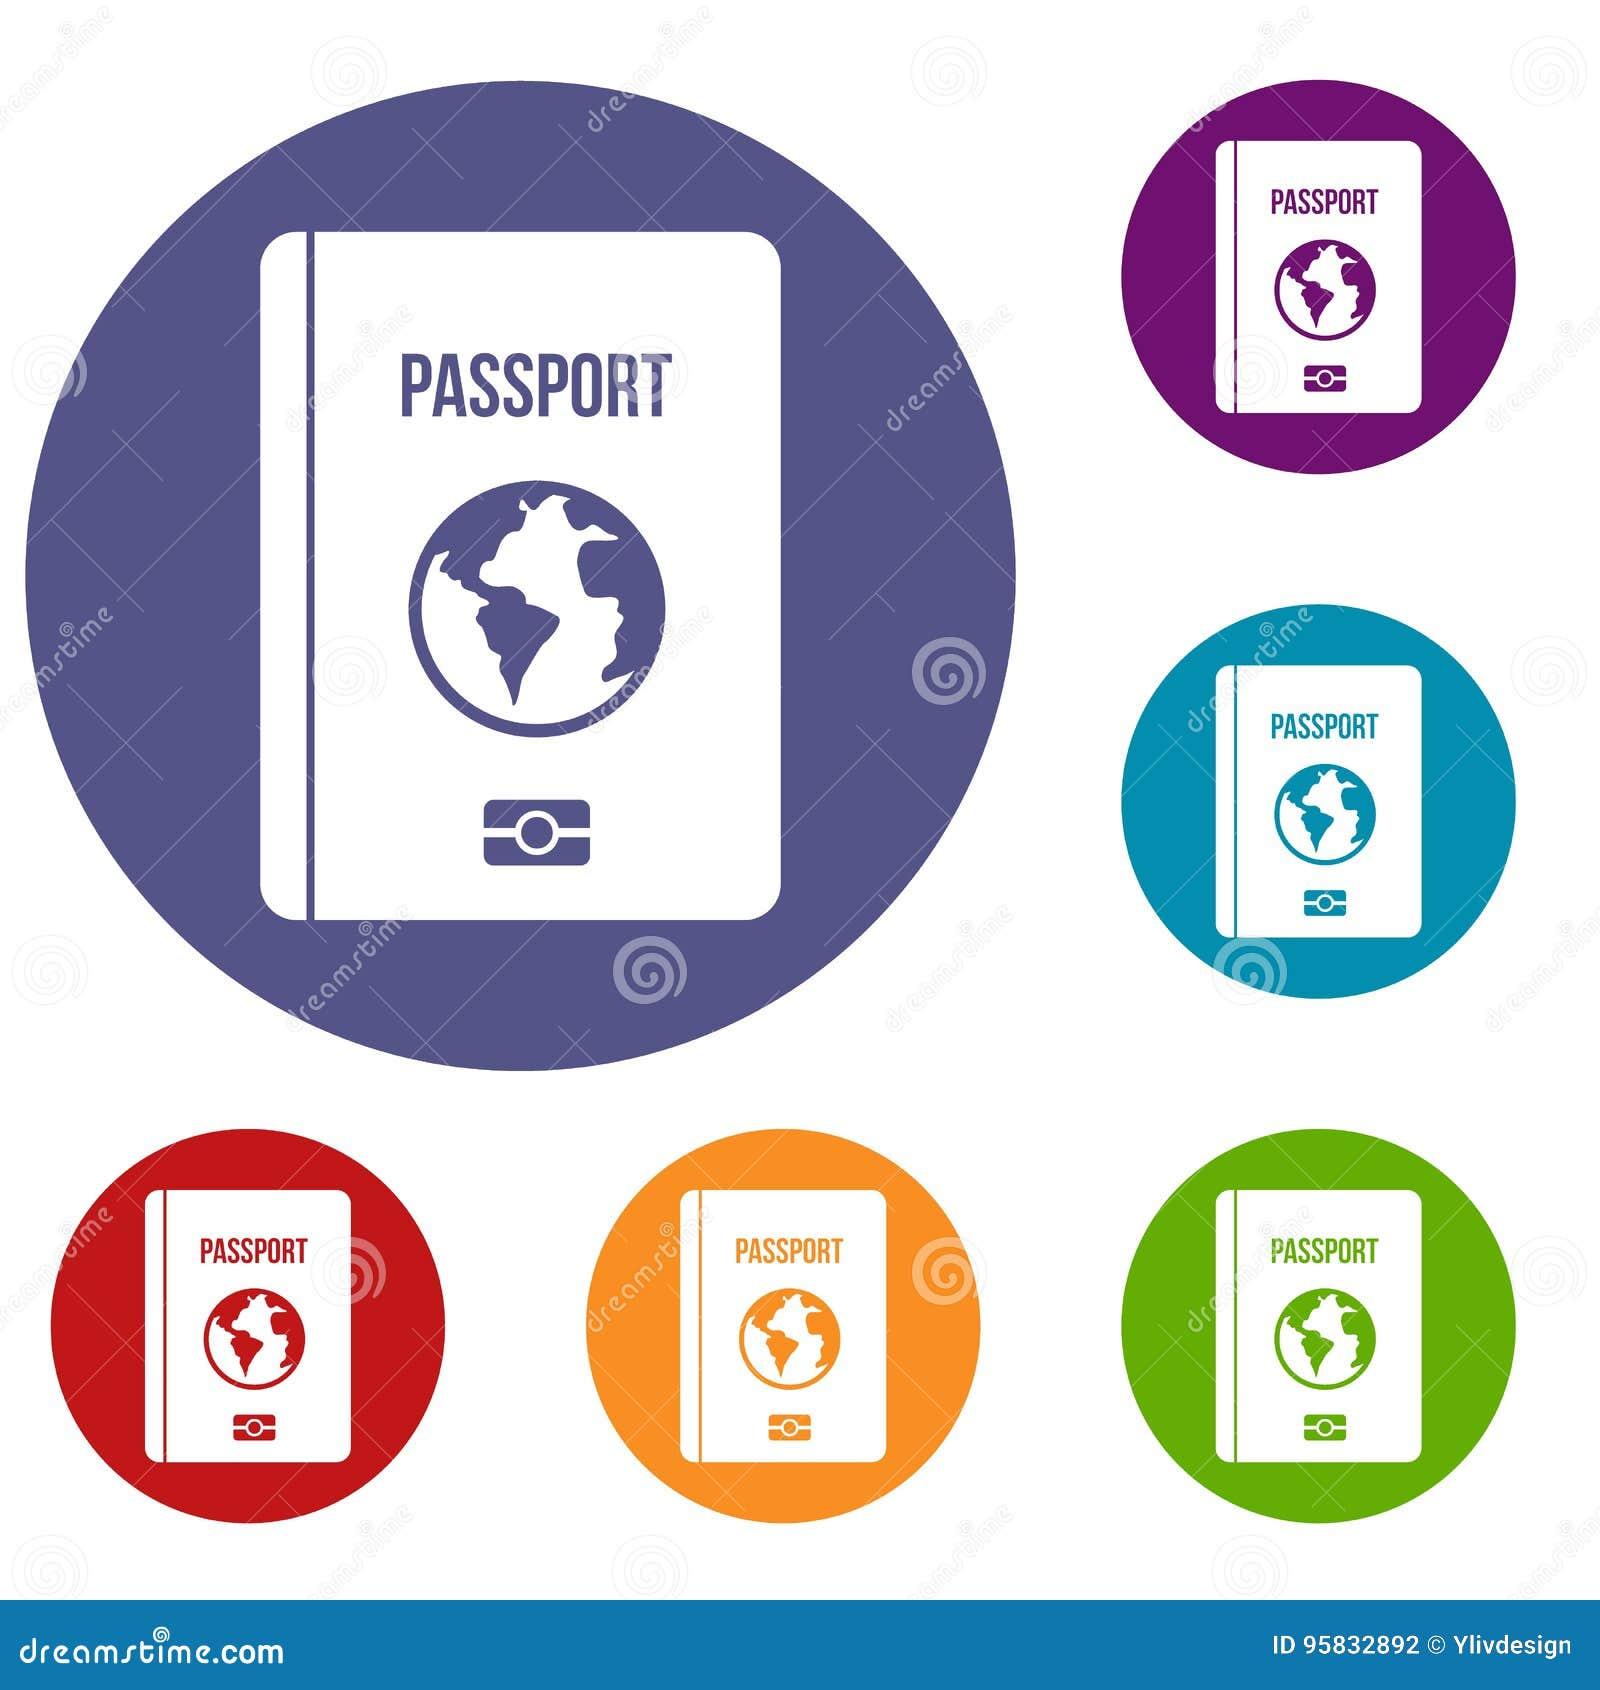 Passport icons set